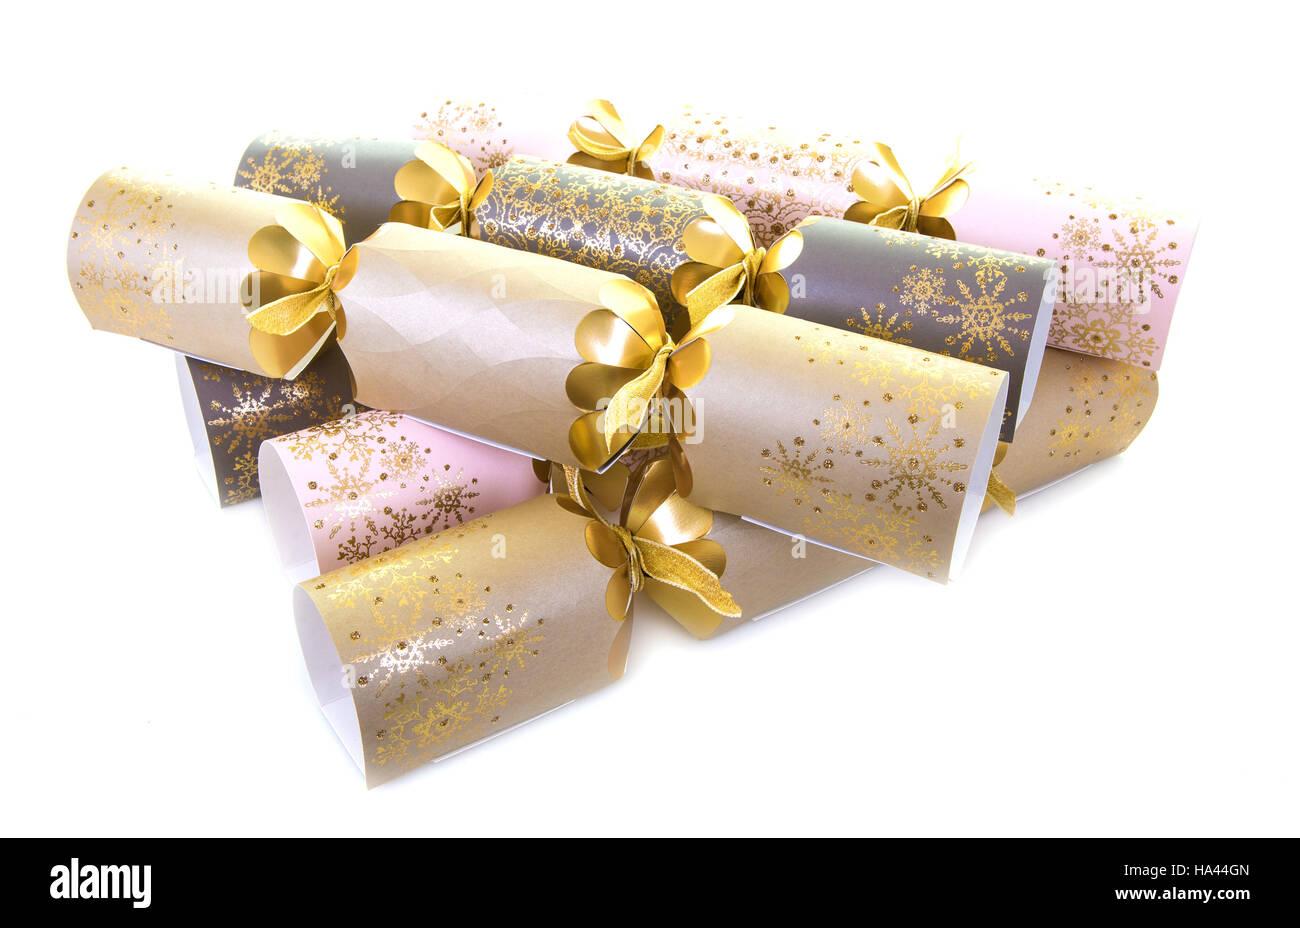 luxury christmas crackers on a white background stock image